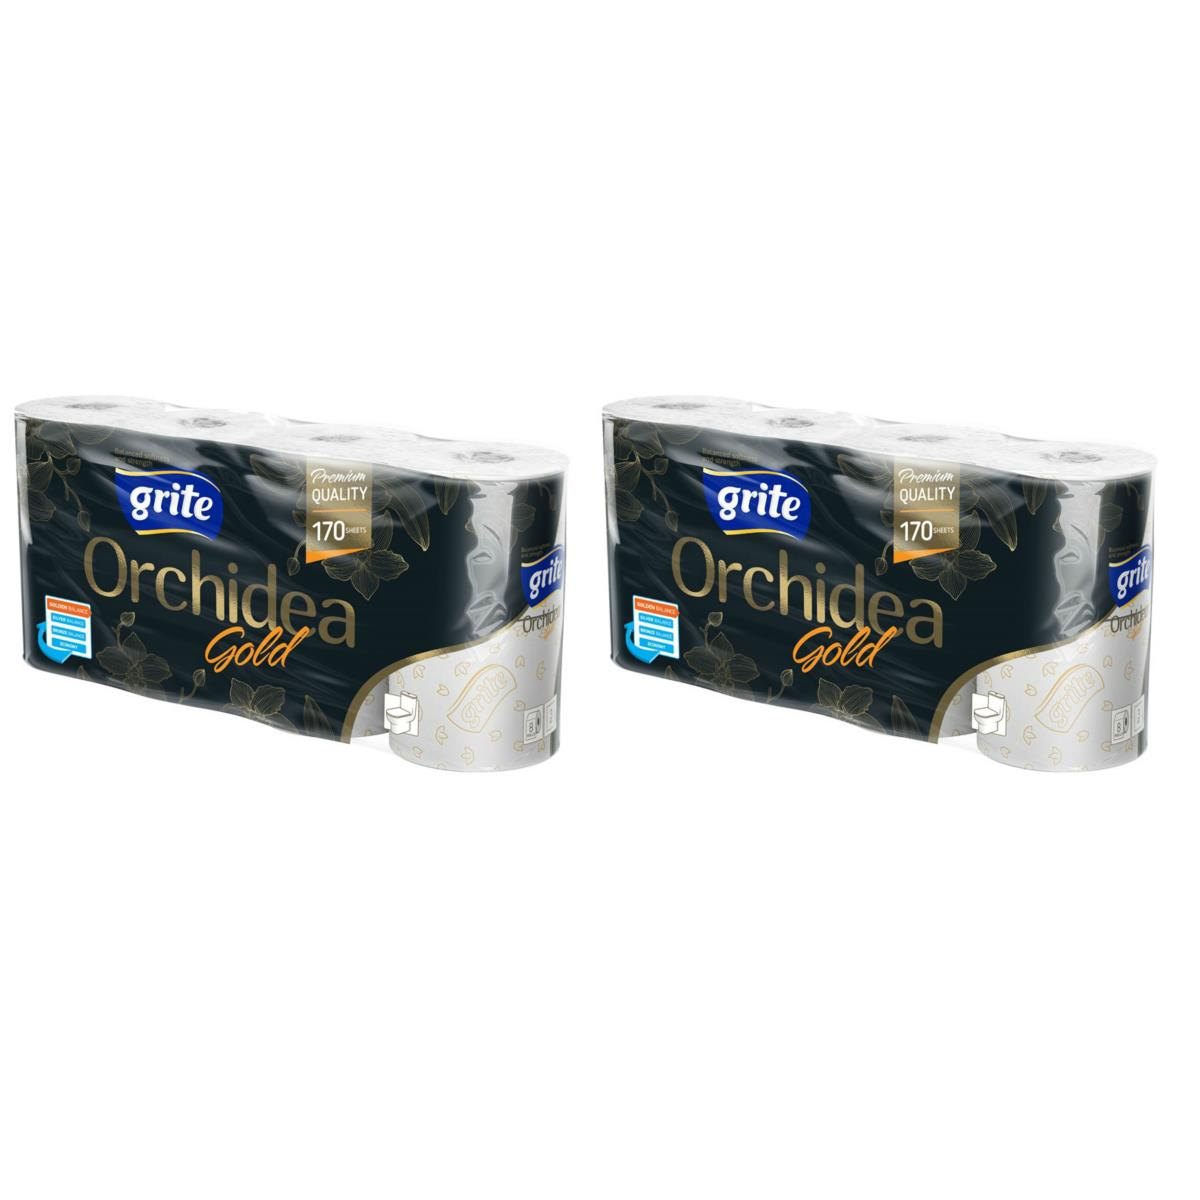 32x Toilettenpapier 0,59€//Stk. 3-lagiges Klopapier Super Soft 252 Blatt